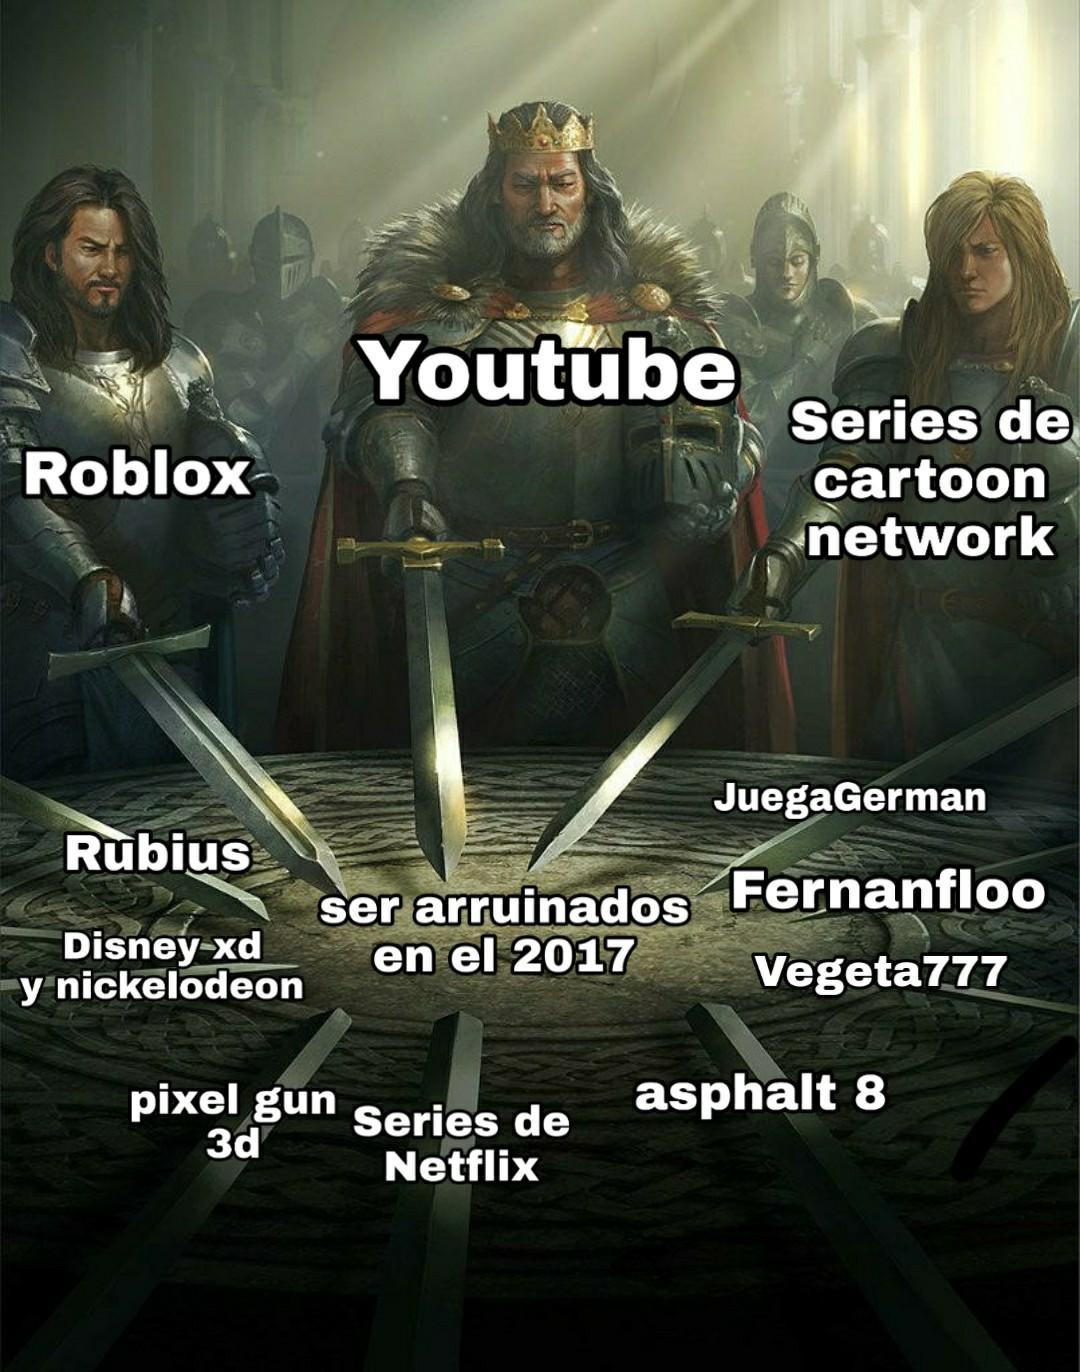 esta va pal 2017 - meme